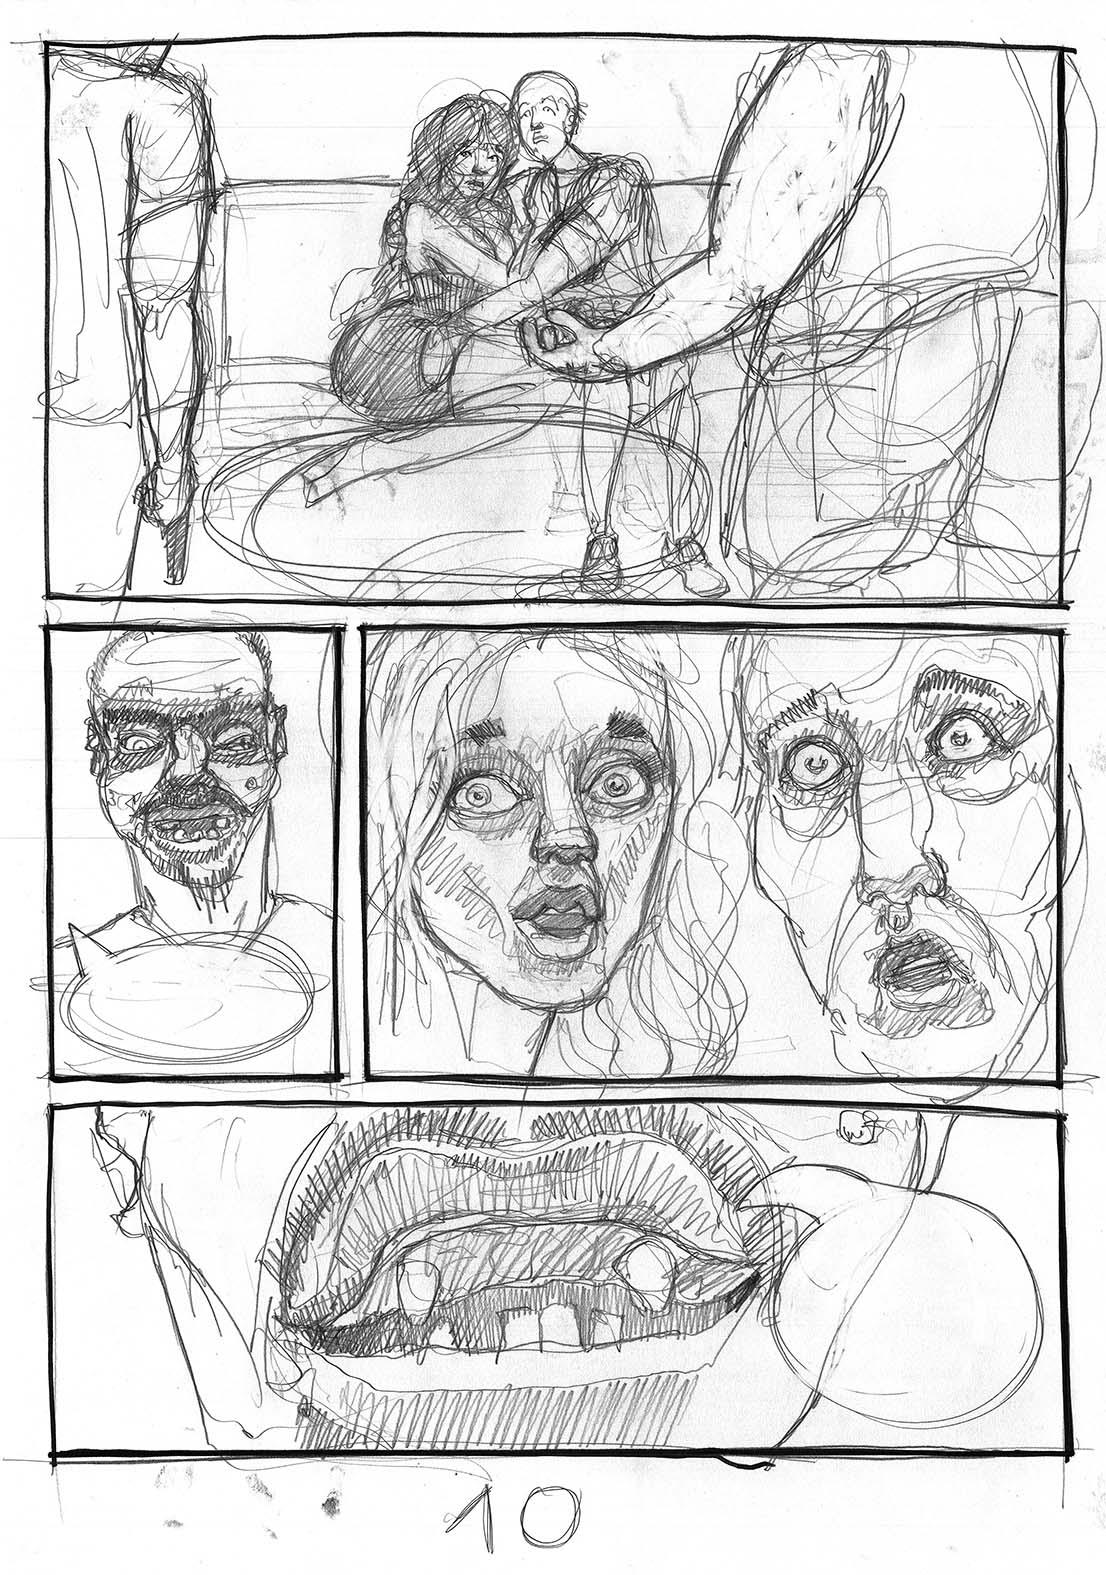 erotic story on line jan kowalewicz